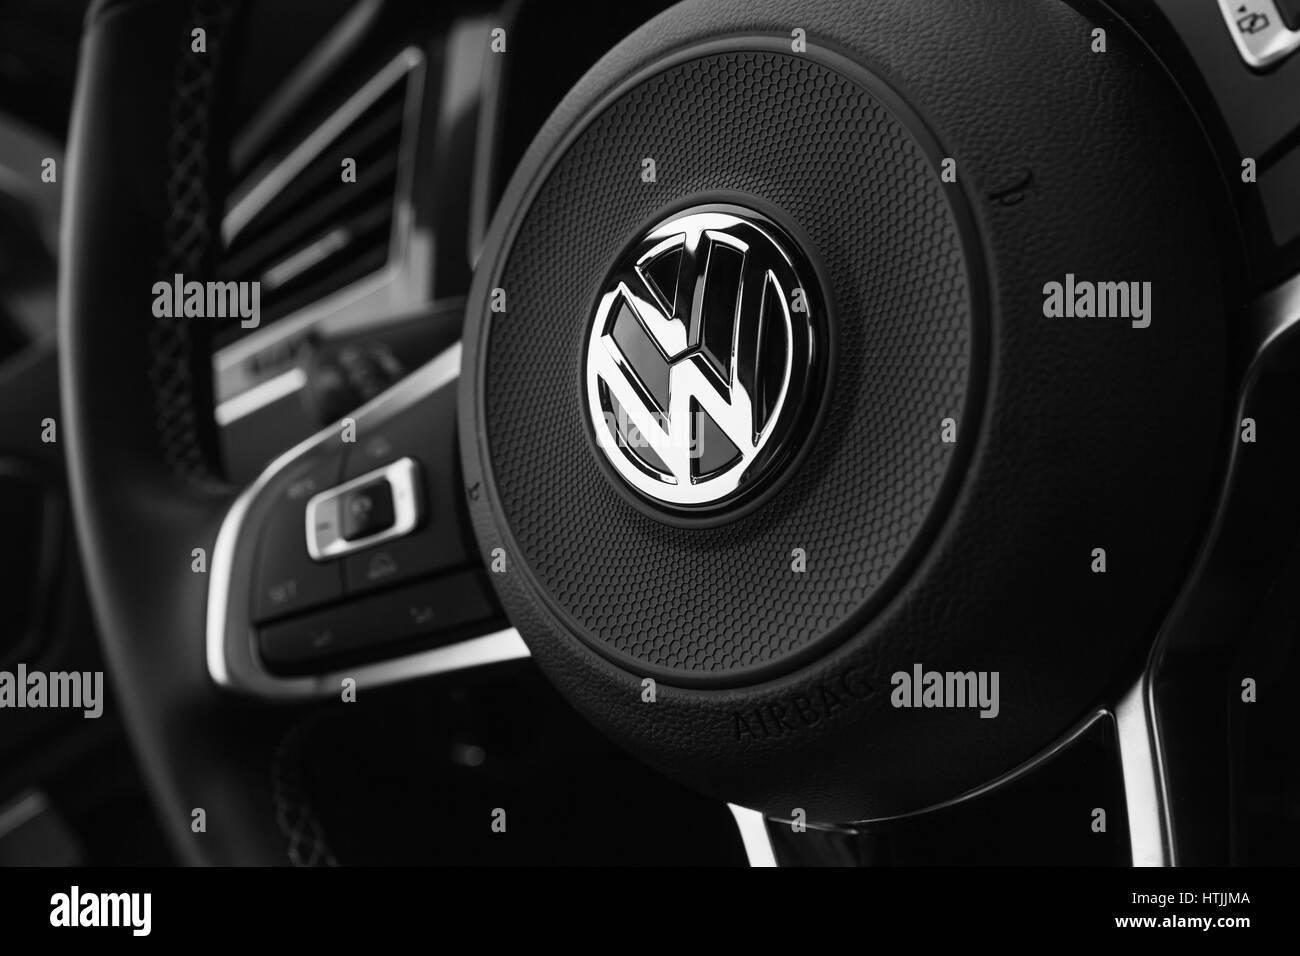 Hamburg, Germany - February 10, 2017: Black steering wheel with logotype of second generation Volkswagen Tiguan, - Stock Image